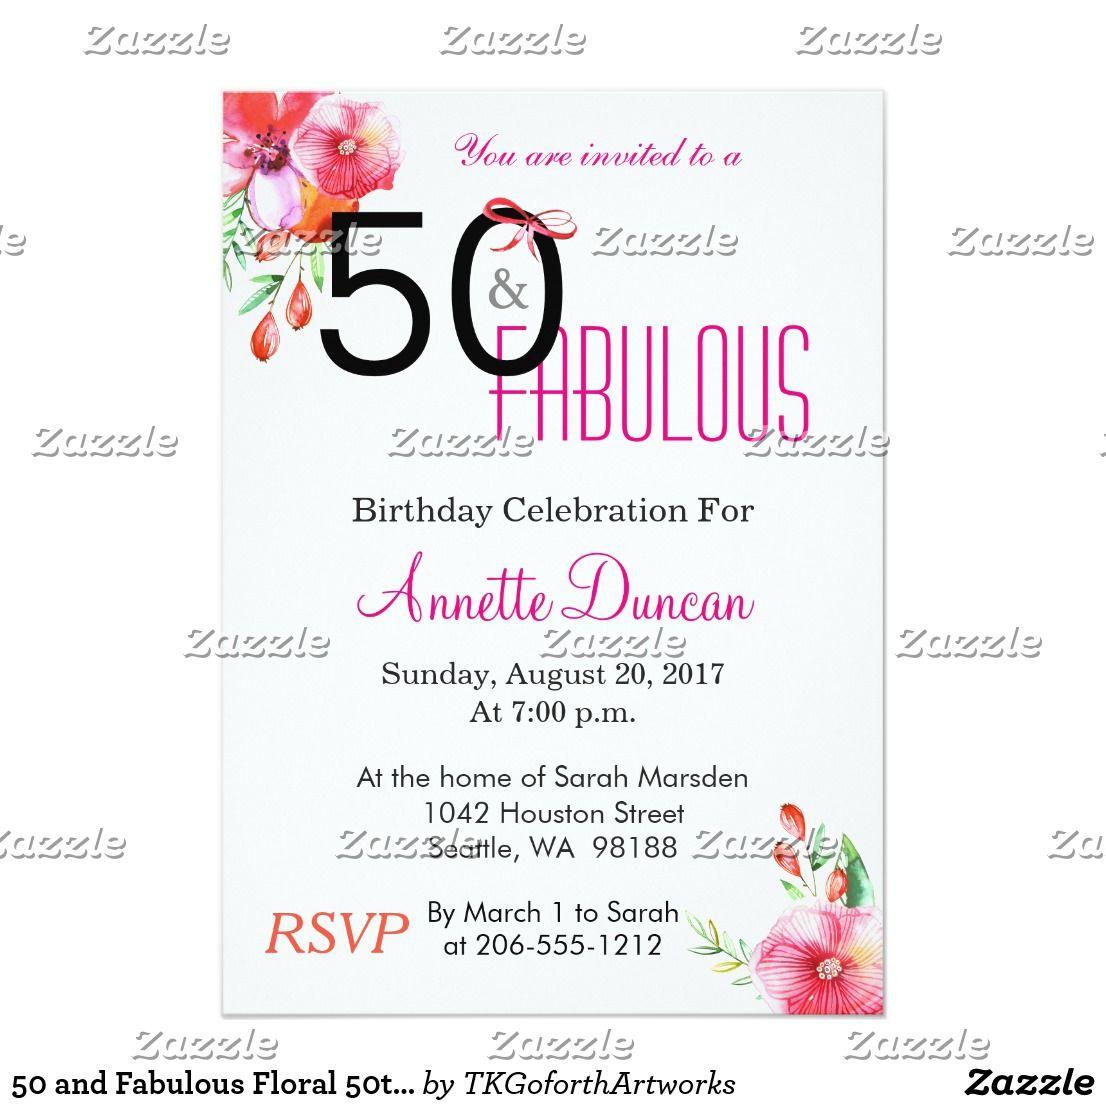 50 and Fabulous Floral 50th Birthday Invitation | Birthday Invites ...